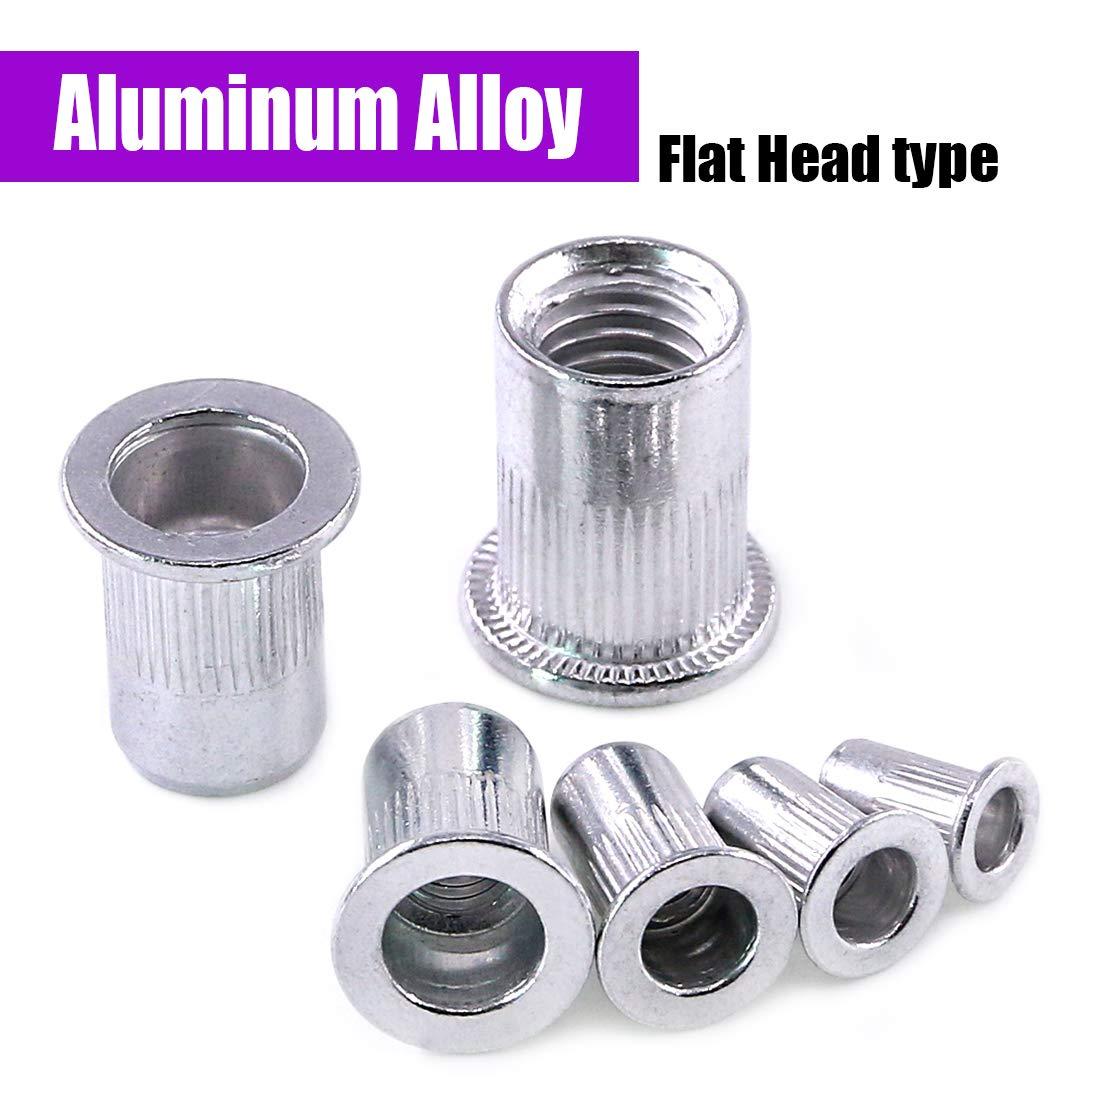 Swpeet 110Pcs Aluminum Alloy Flat Head Rivet Nut Kit, Including Assorted M3 M4 M5 M6 M8 M10 Aluminum Treaded Insert Nutsert Perfect for Providing High Strength Load Bearing Threads by Swpeet (Image #3)